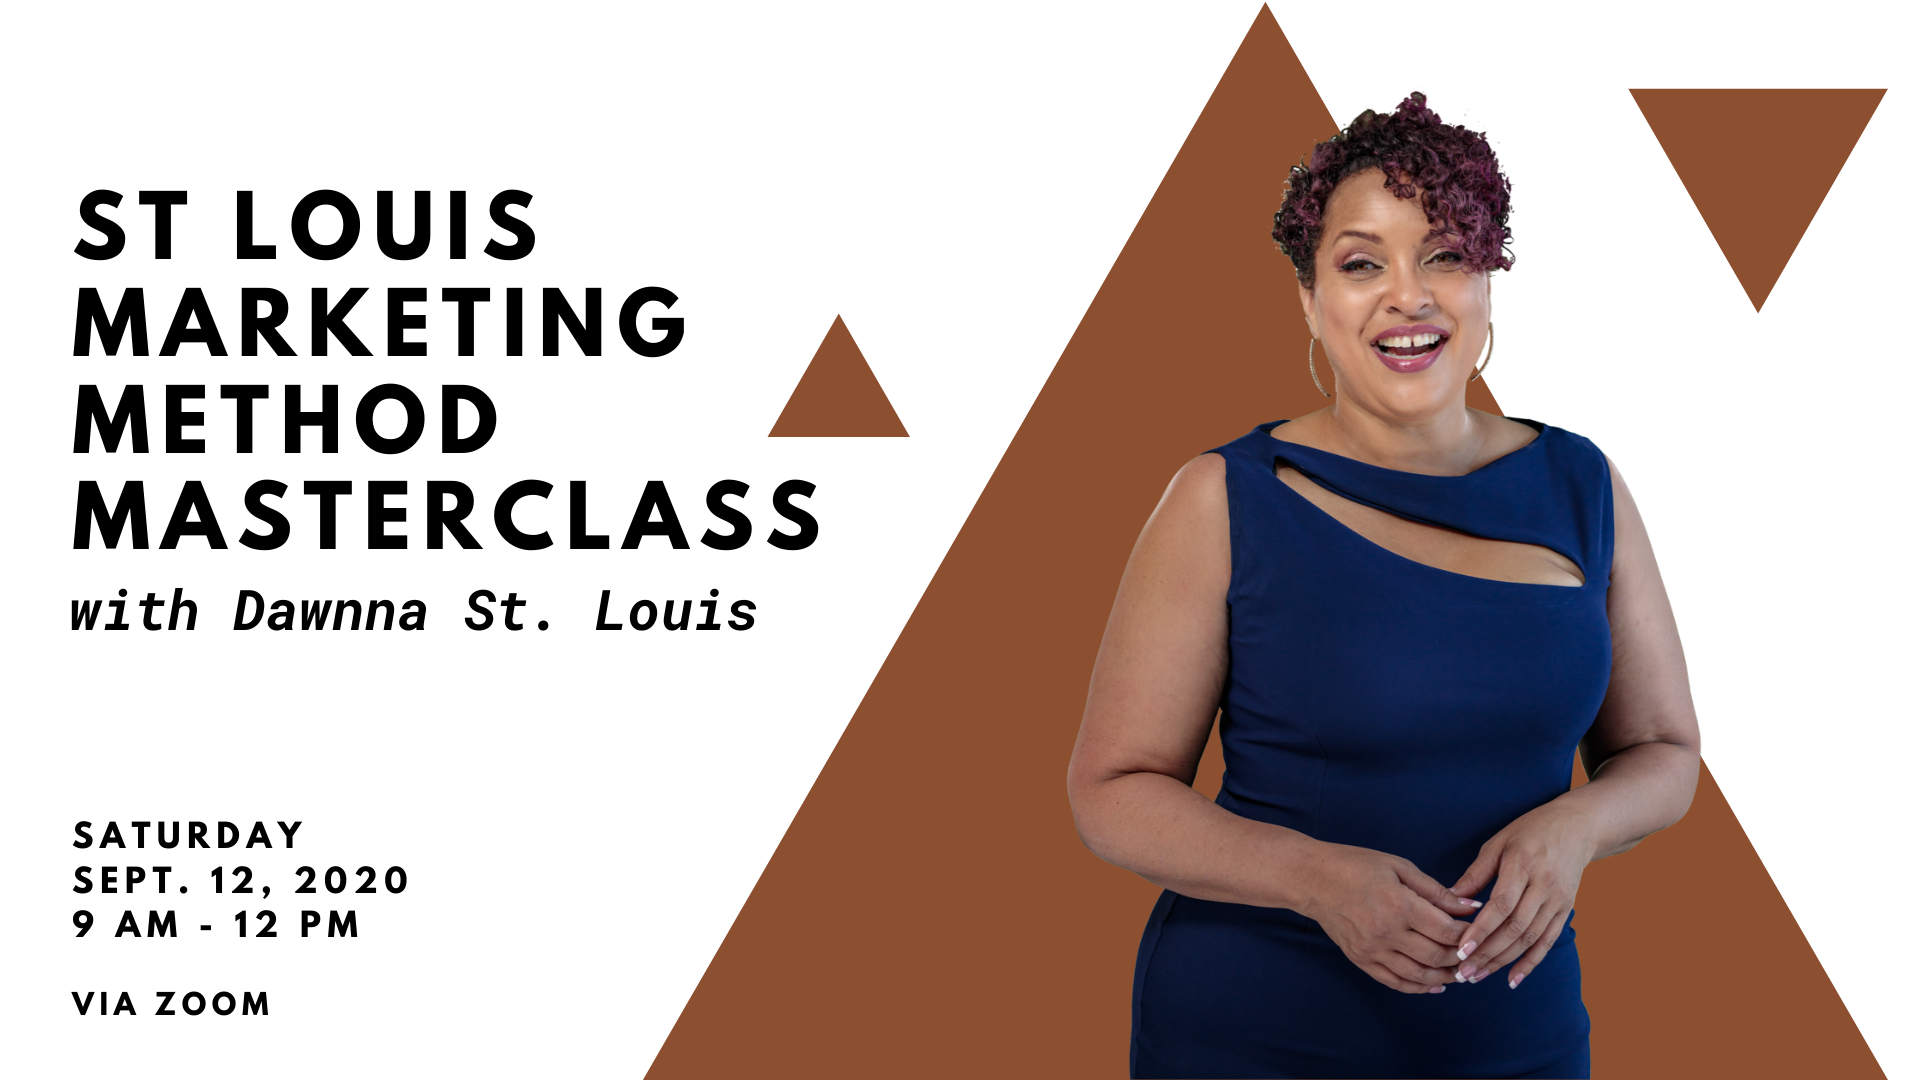 2020 Sep 12 Dawnna St Louis Event Video